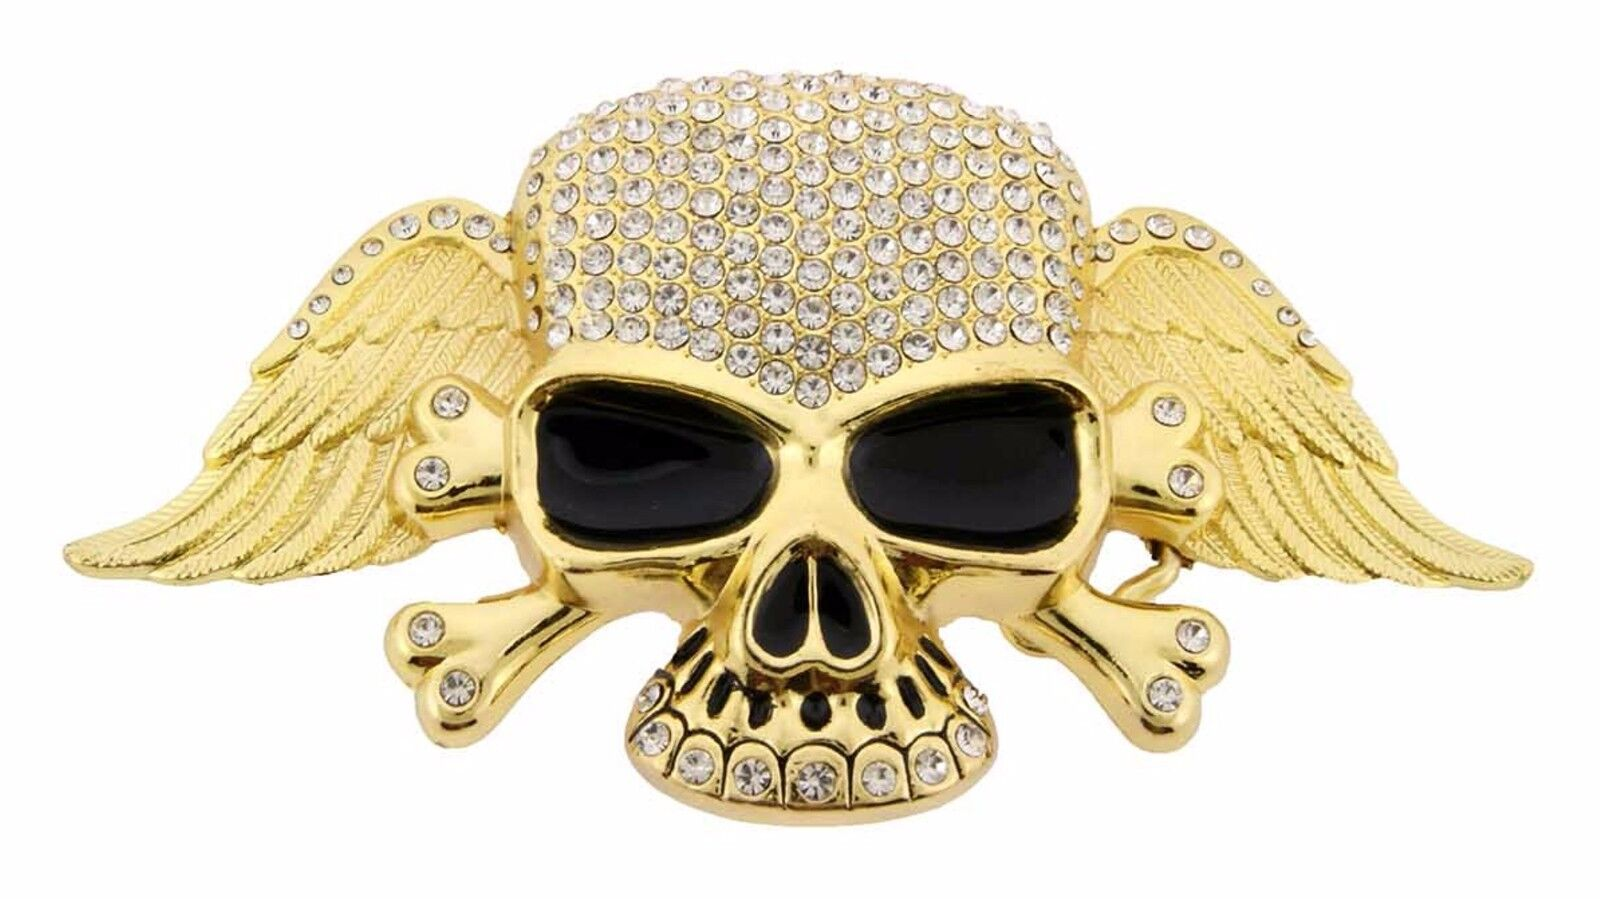 Herren Damen Totenkopf Gürtelschnalle Metall Tattoo Piraten Kreuz Knochen